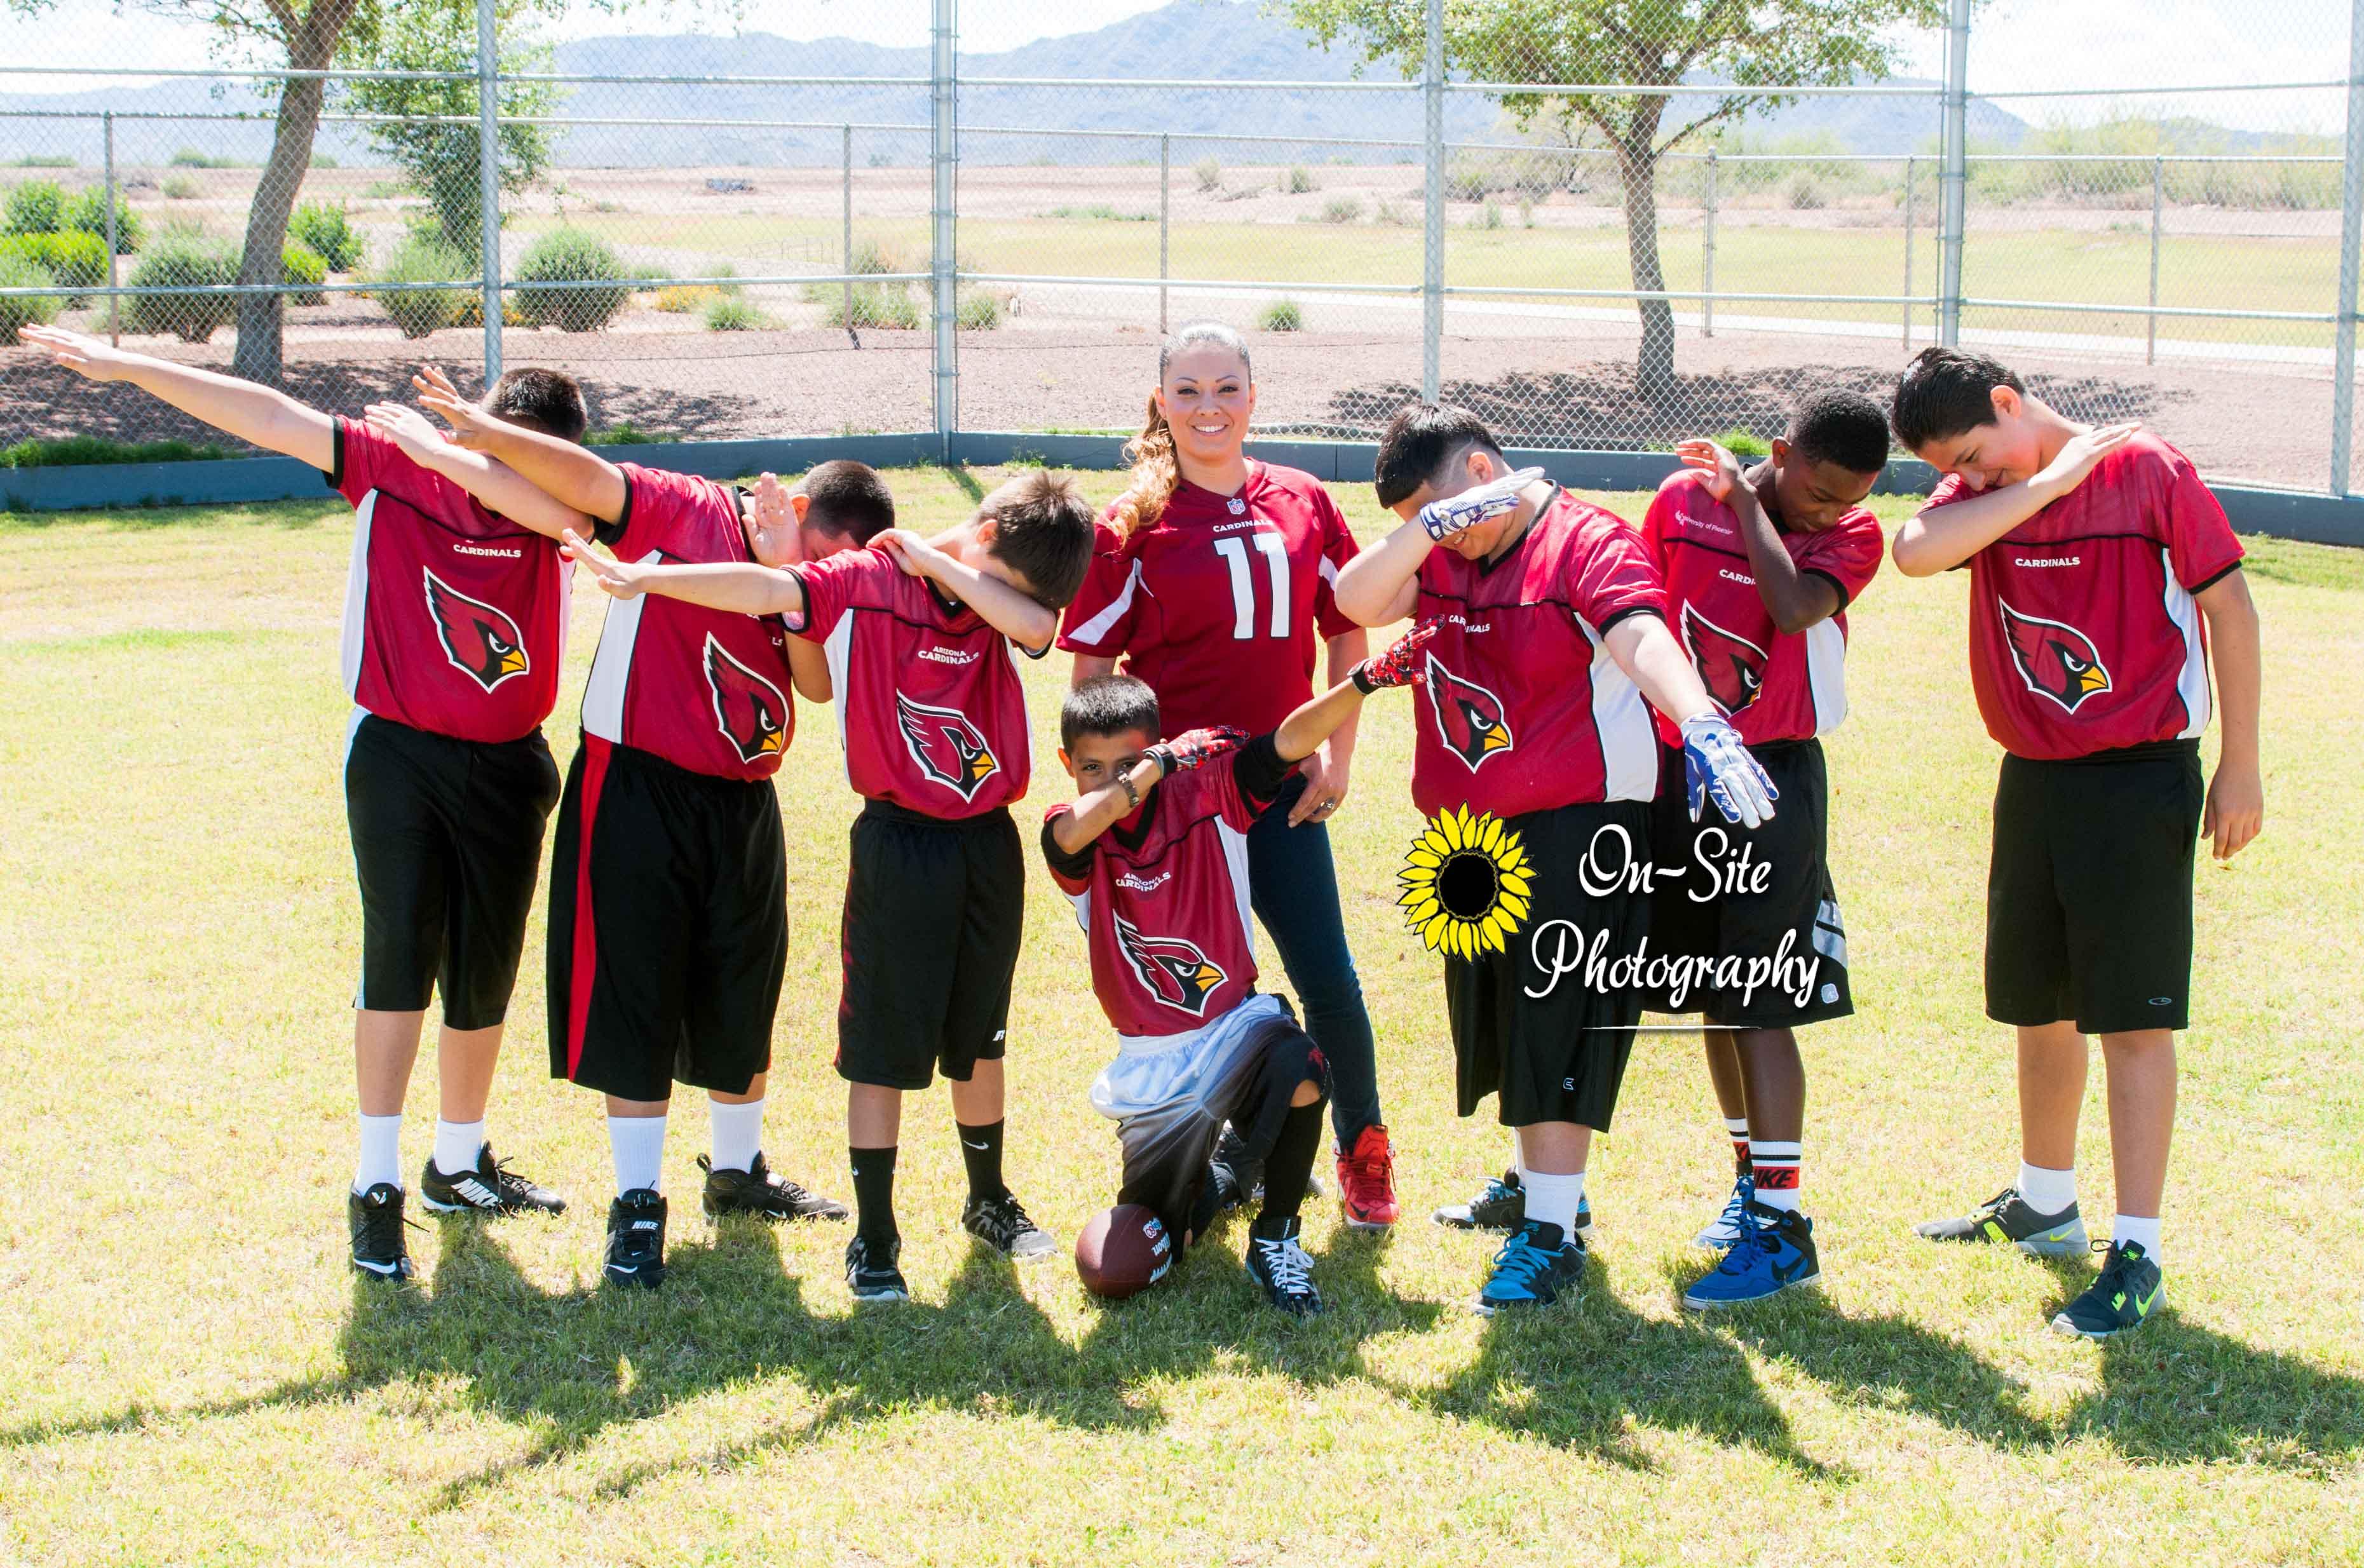 Funny Team Photo On-Site Photography sports photographer, buckeye, goodyear, avondale, az